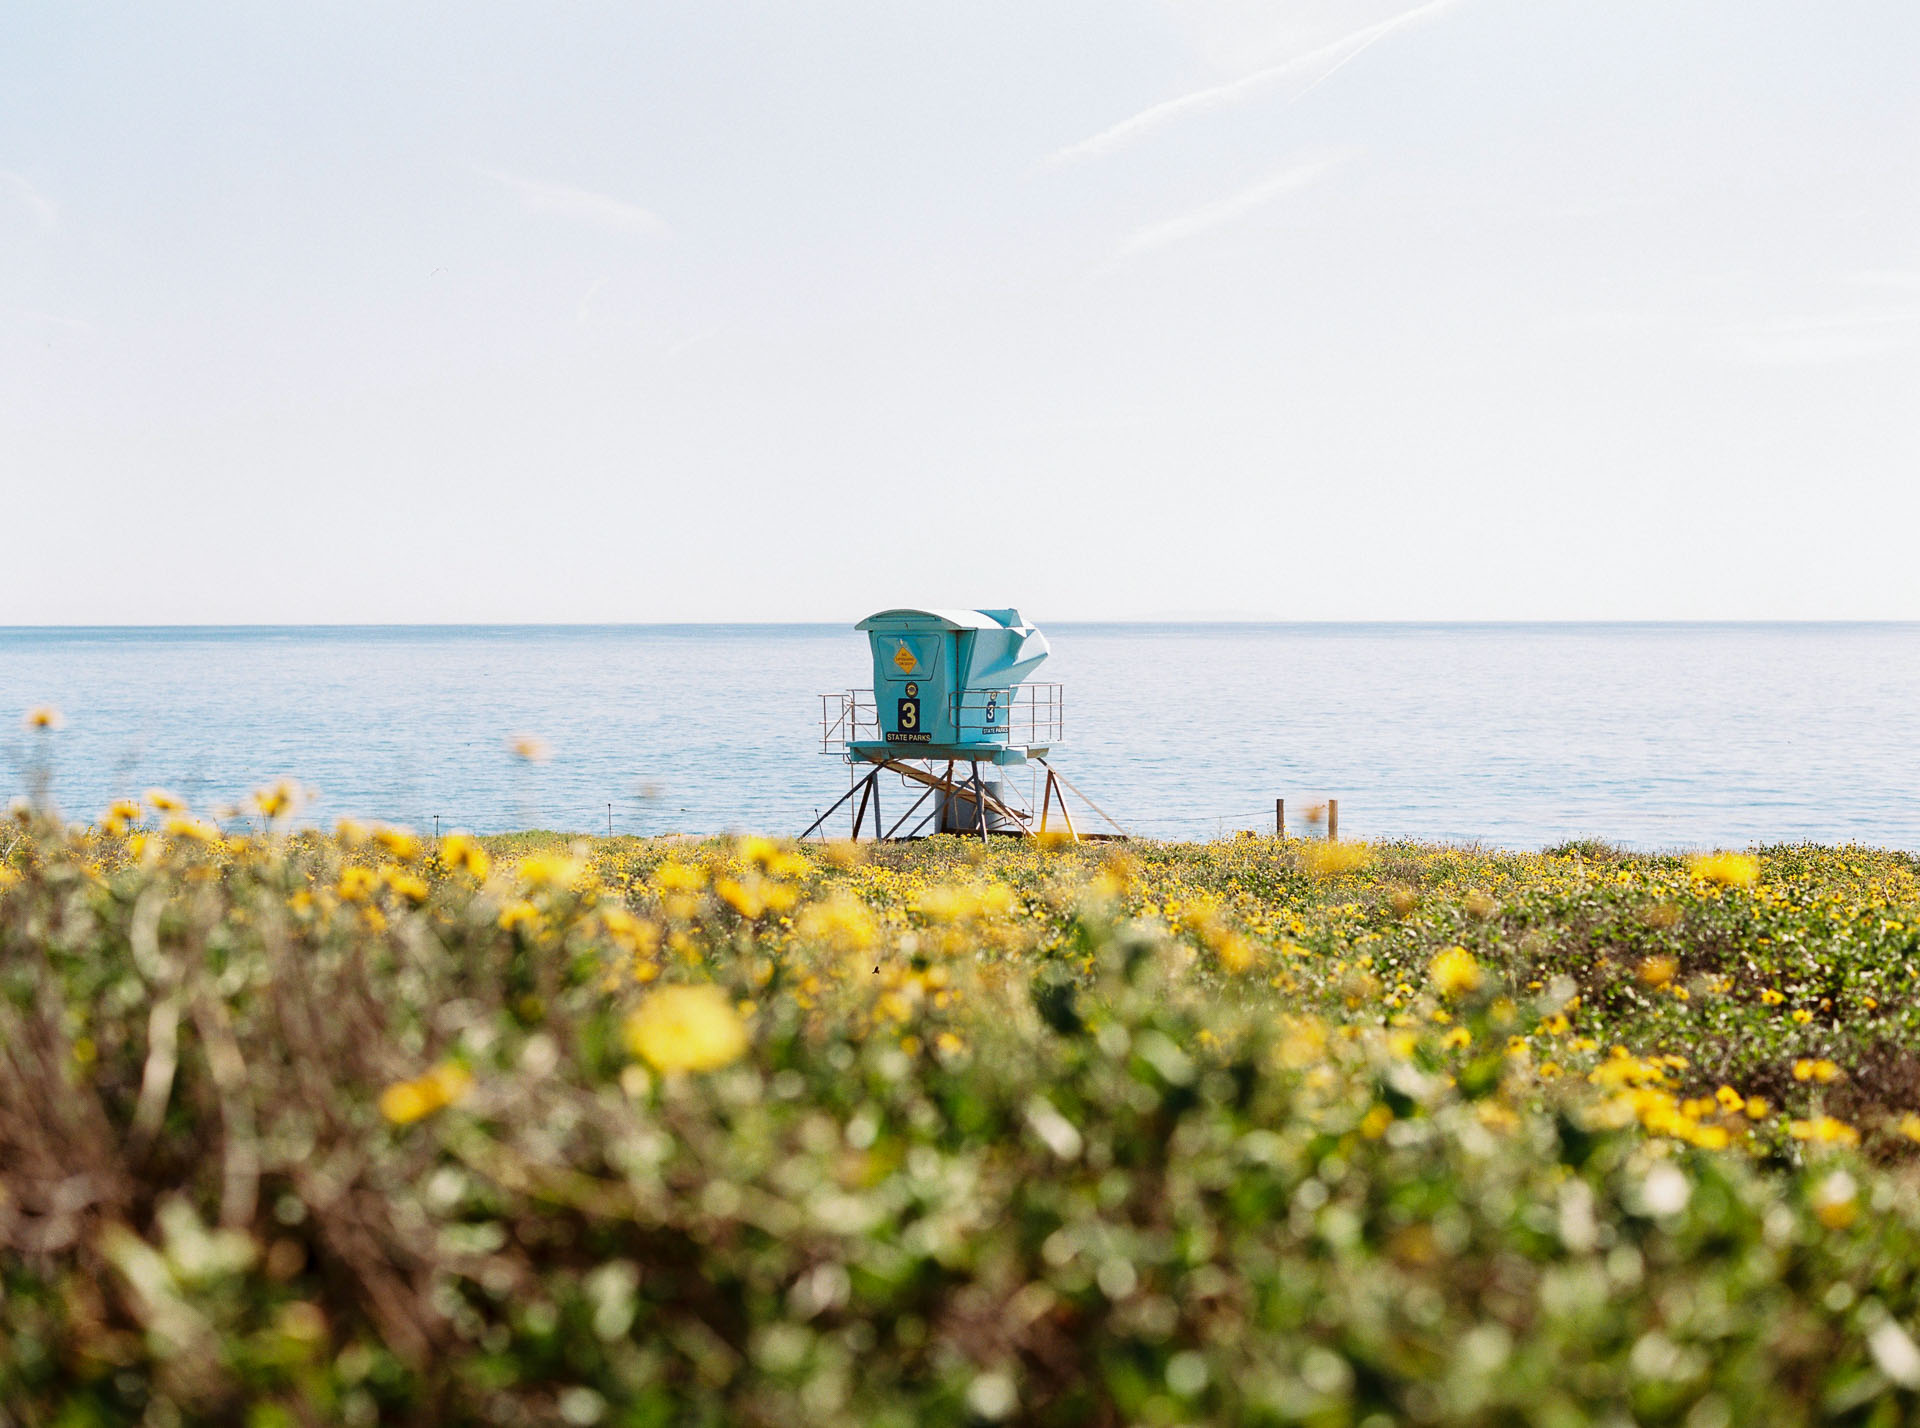 Field_Trip_2015_California_ElCapitanCanyon_JeanLaurentGaudy_002